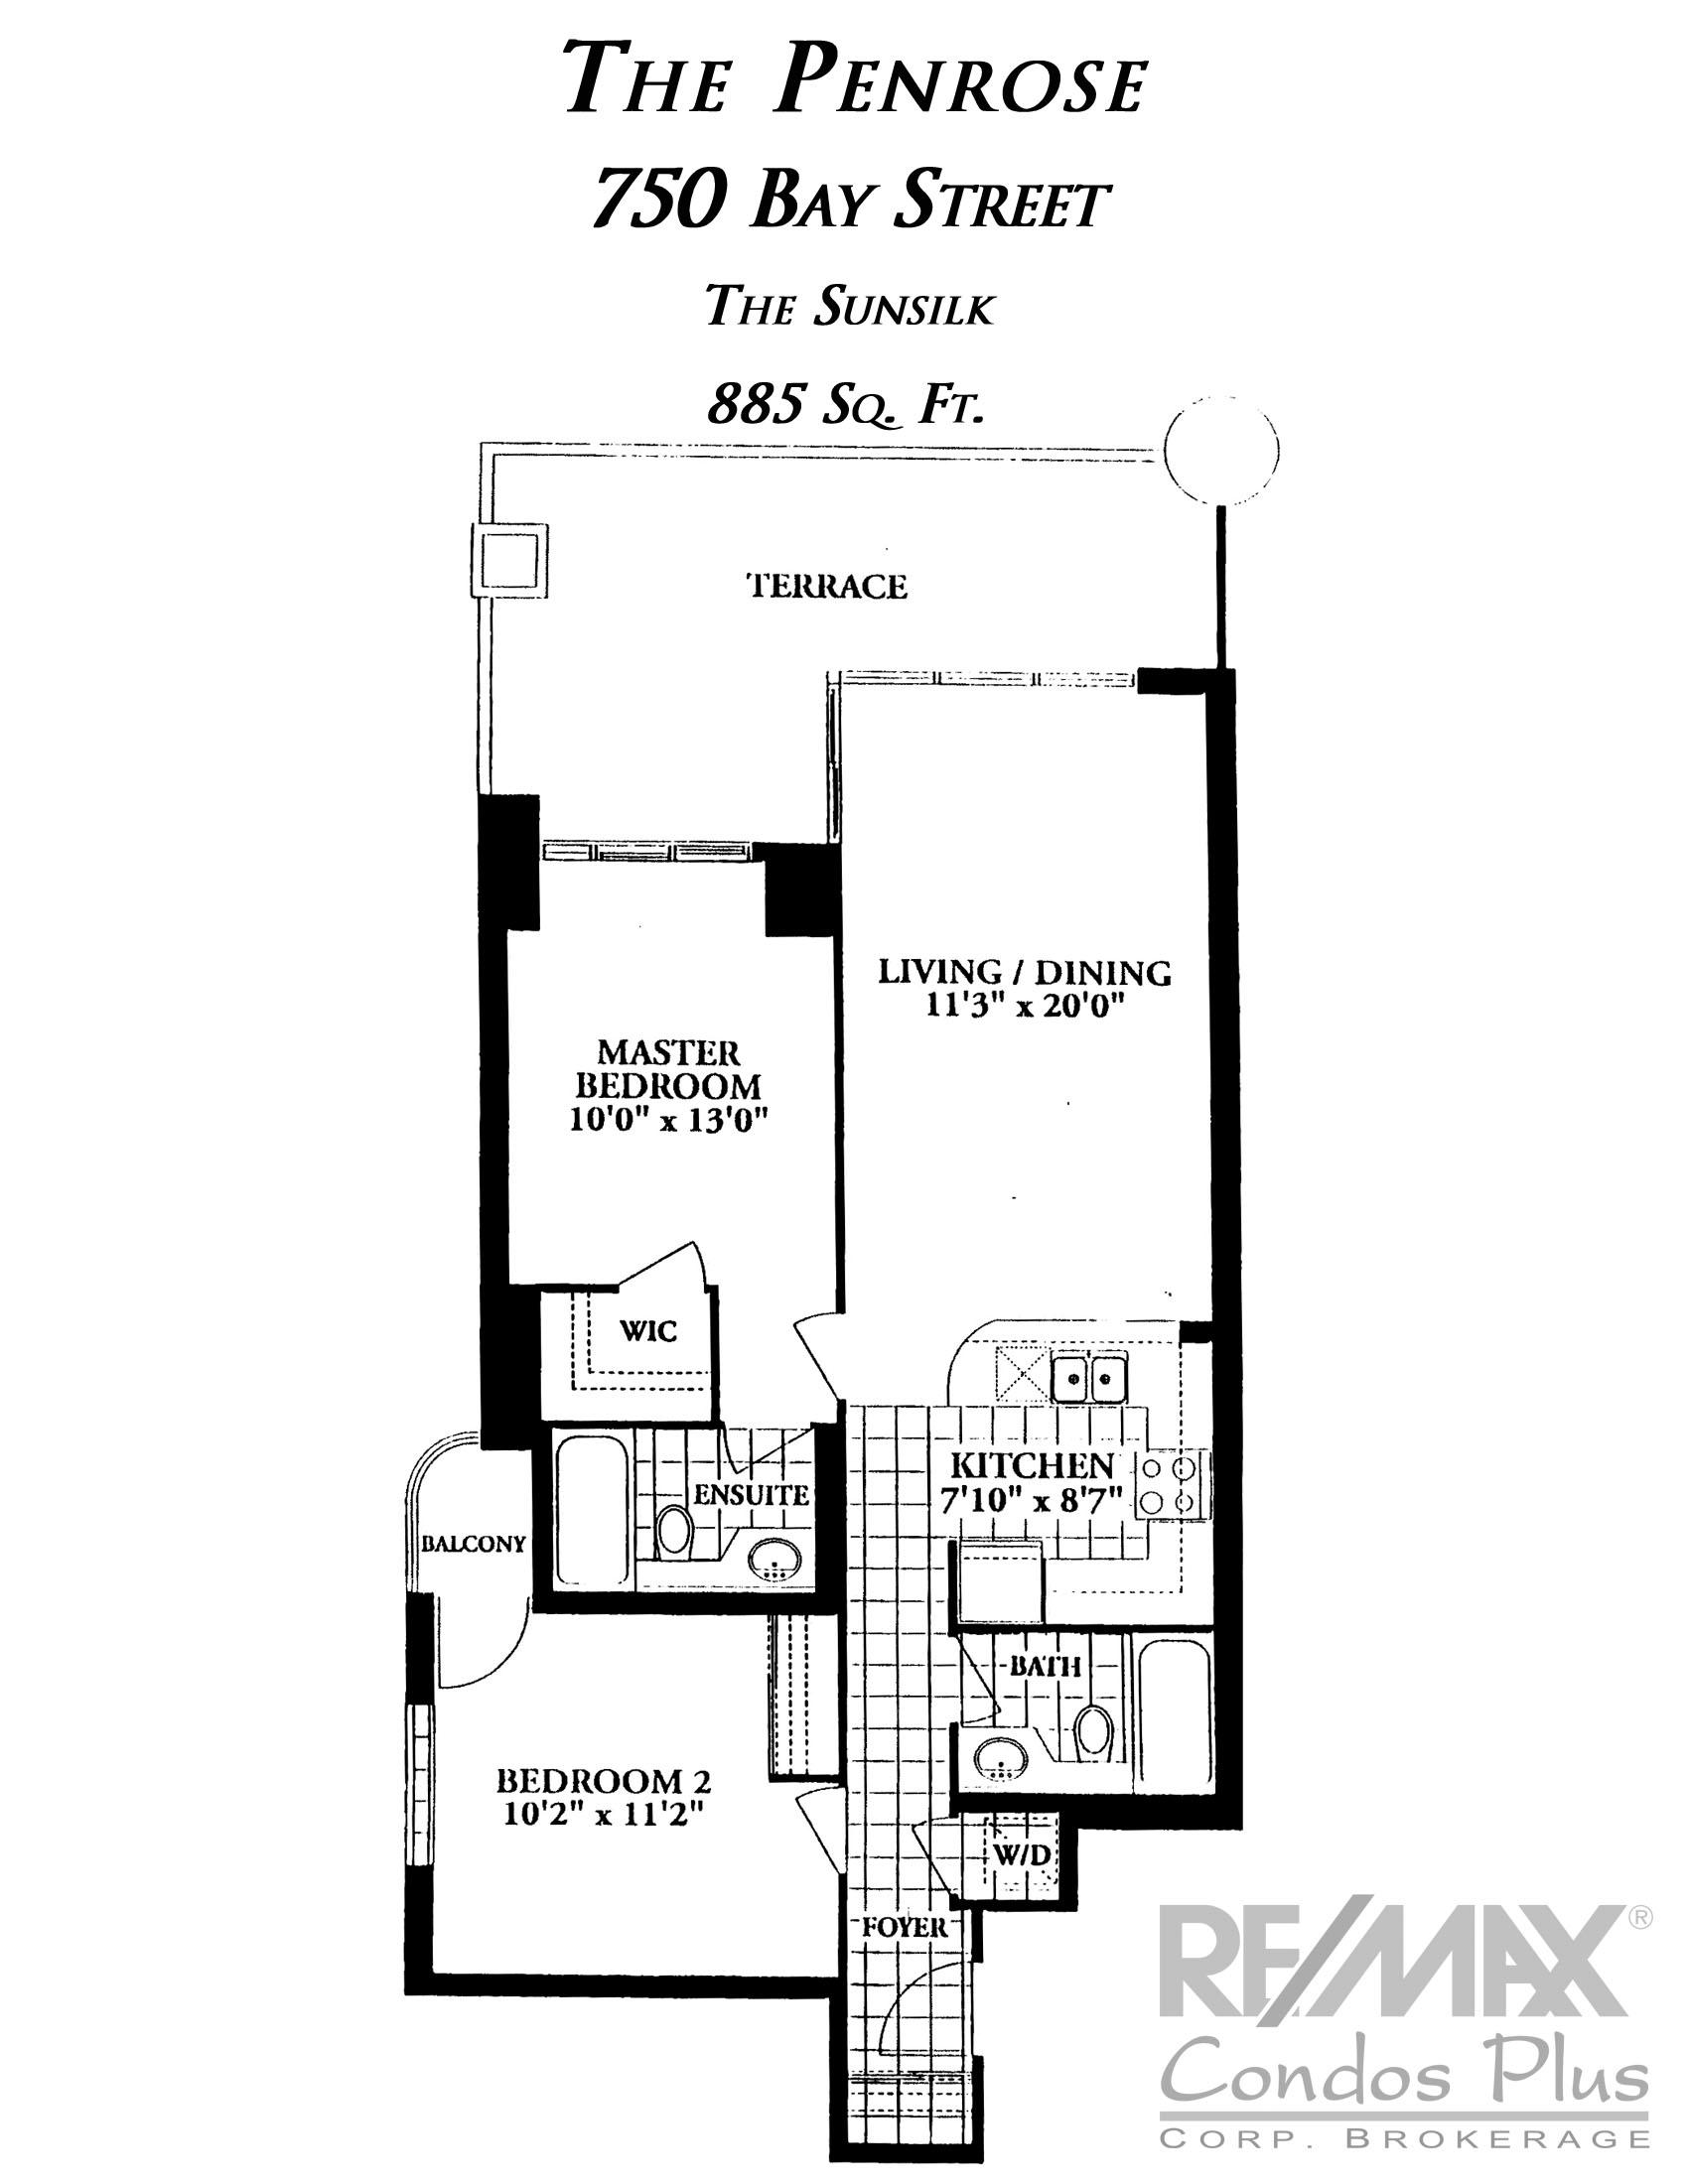 The Sunsilk: 2 Bedroom, 885 SqFt